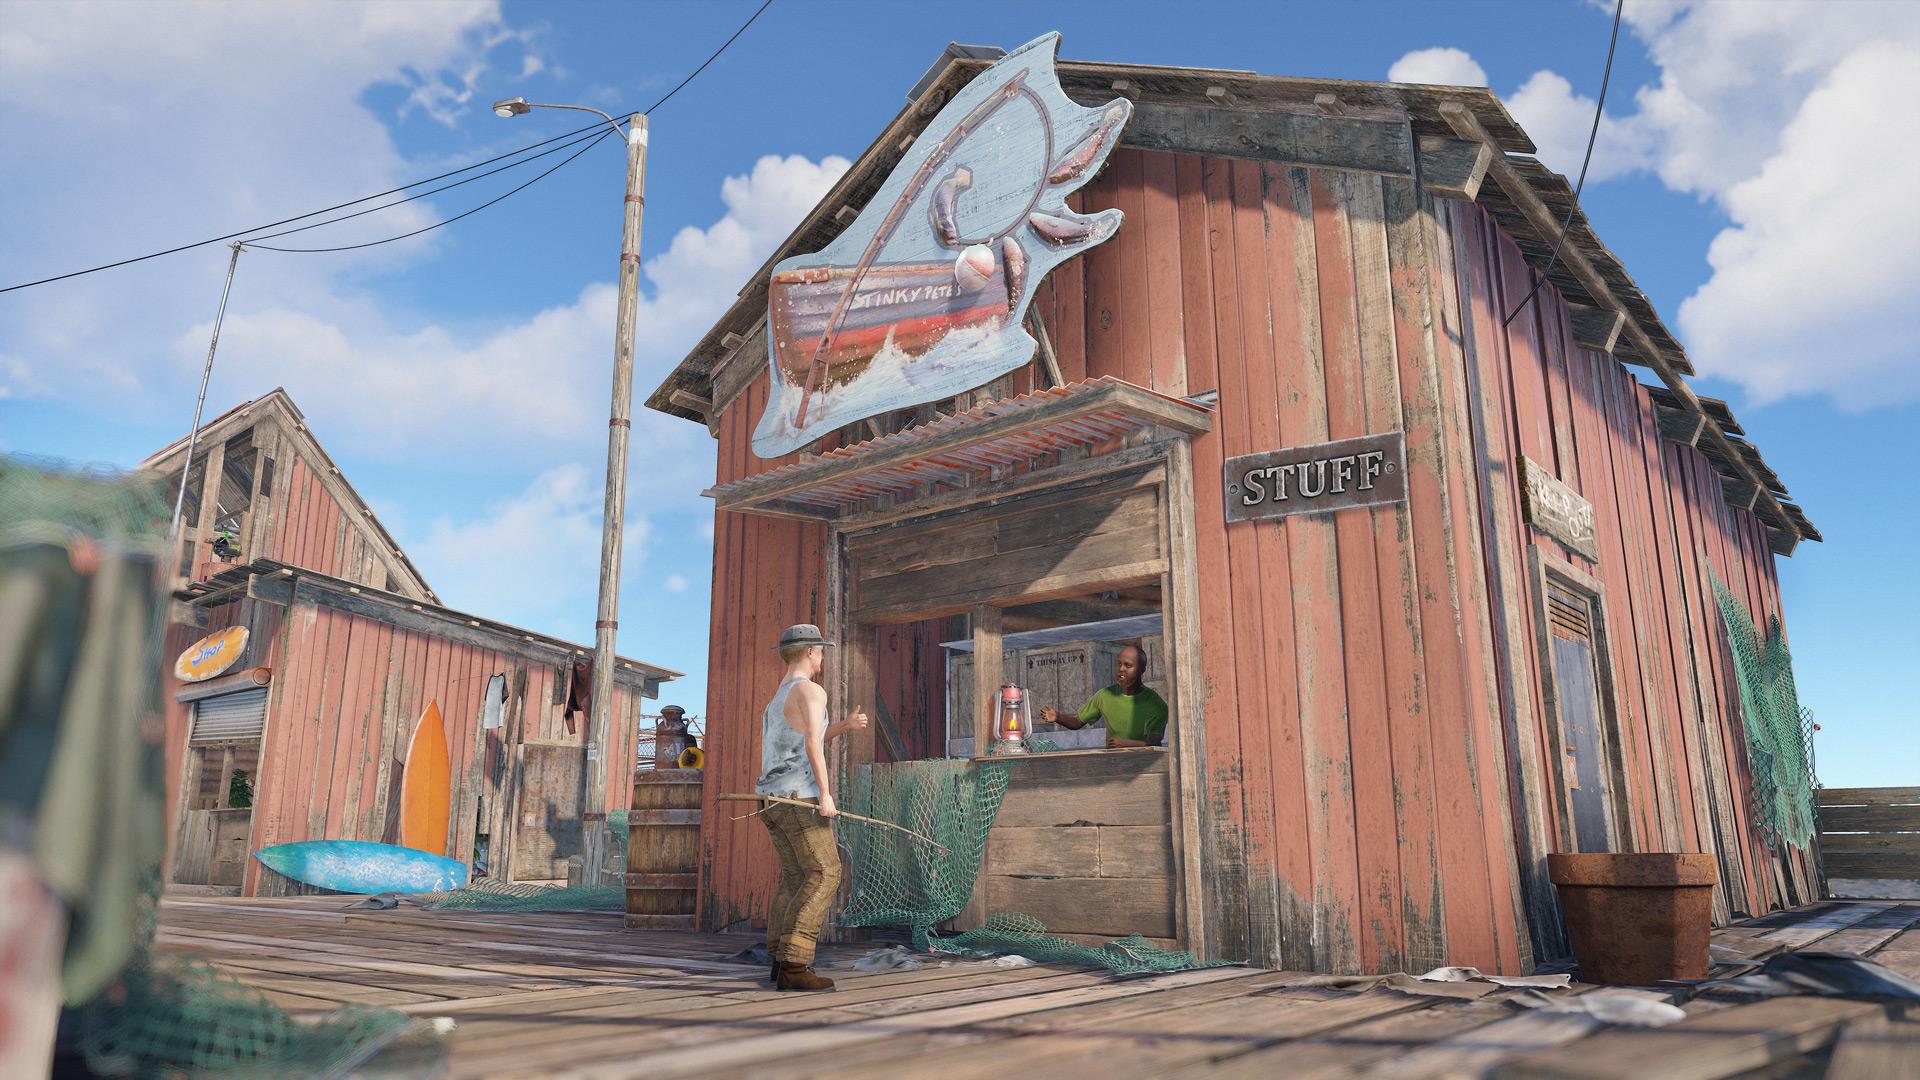 fishingvillage_store1.jpg